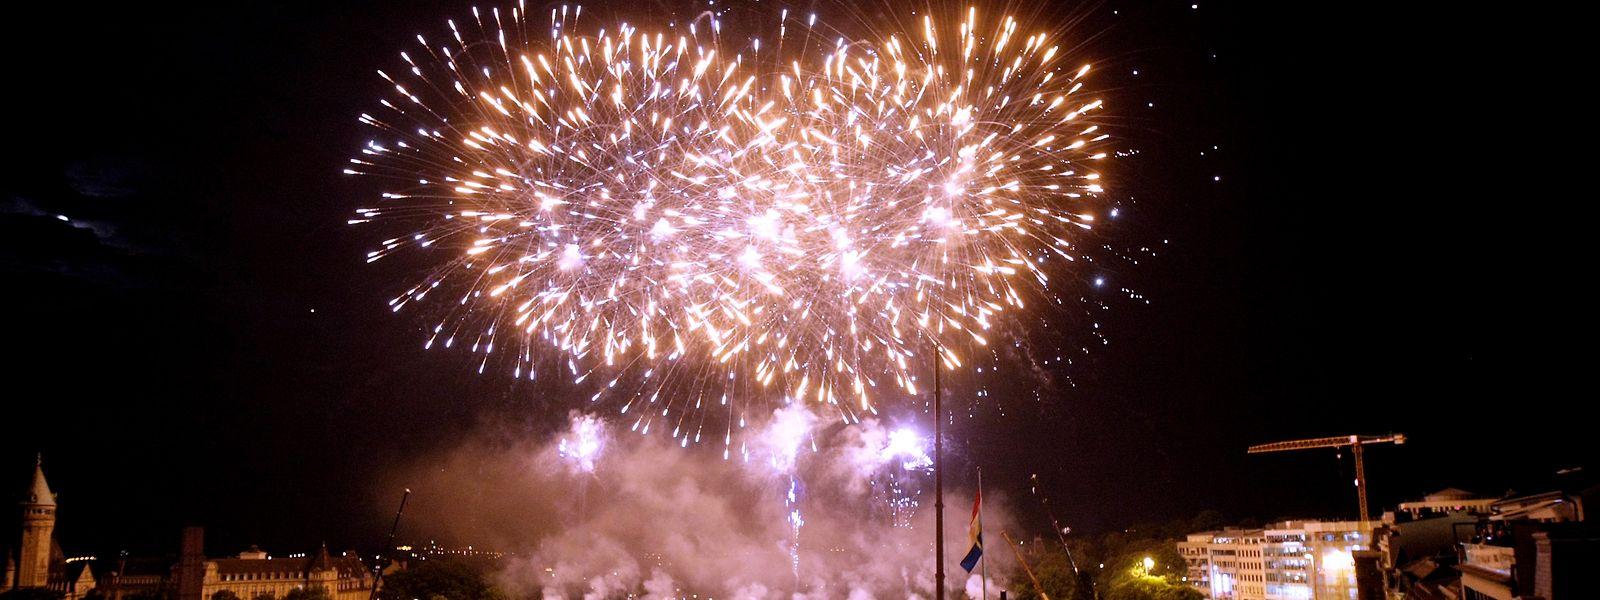 23.06.10 Nationalfeiertag,Fete nationale,Feuerwerk, feu d artifice.Foto:Gerry Huberty